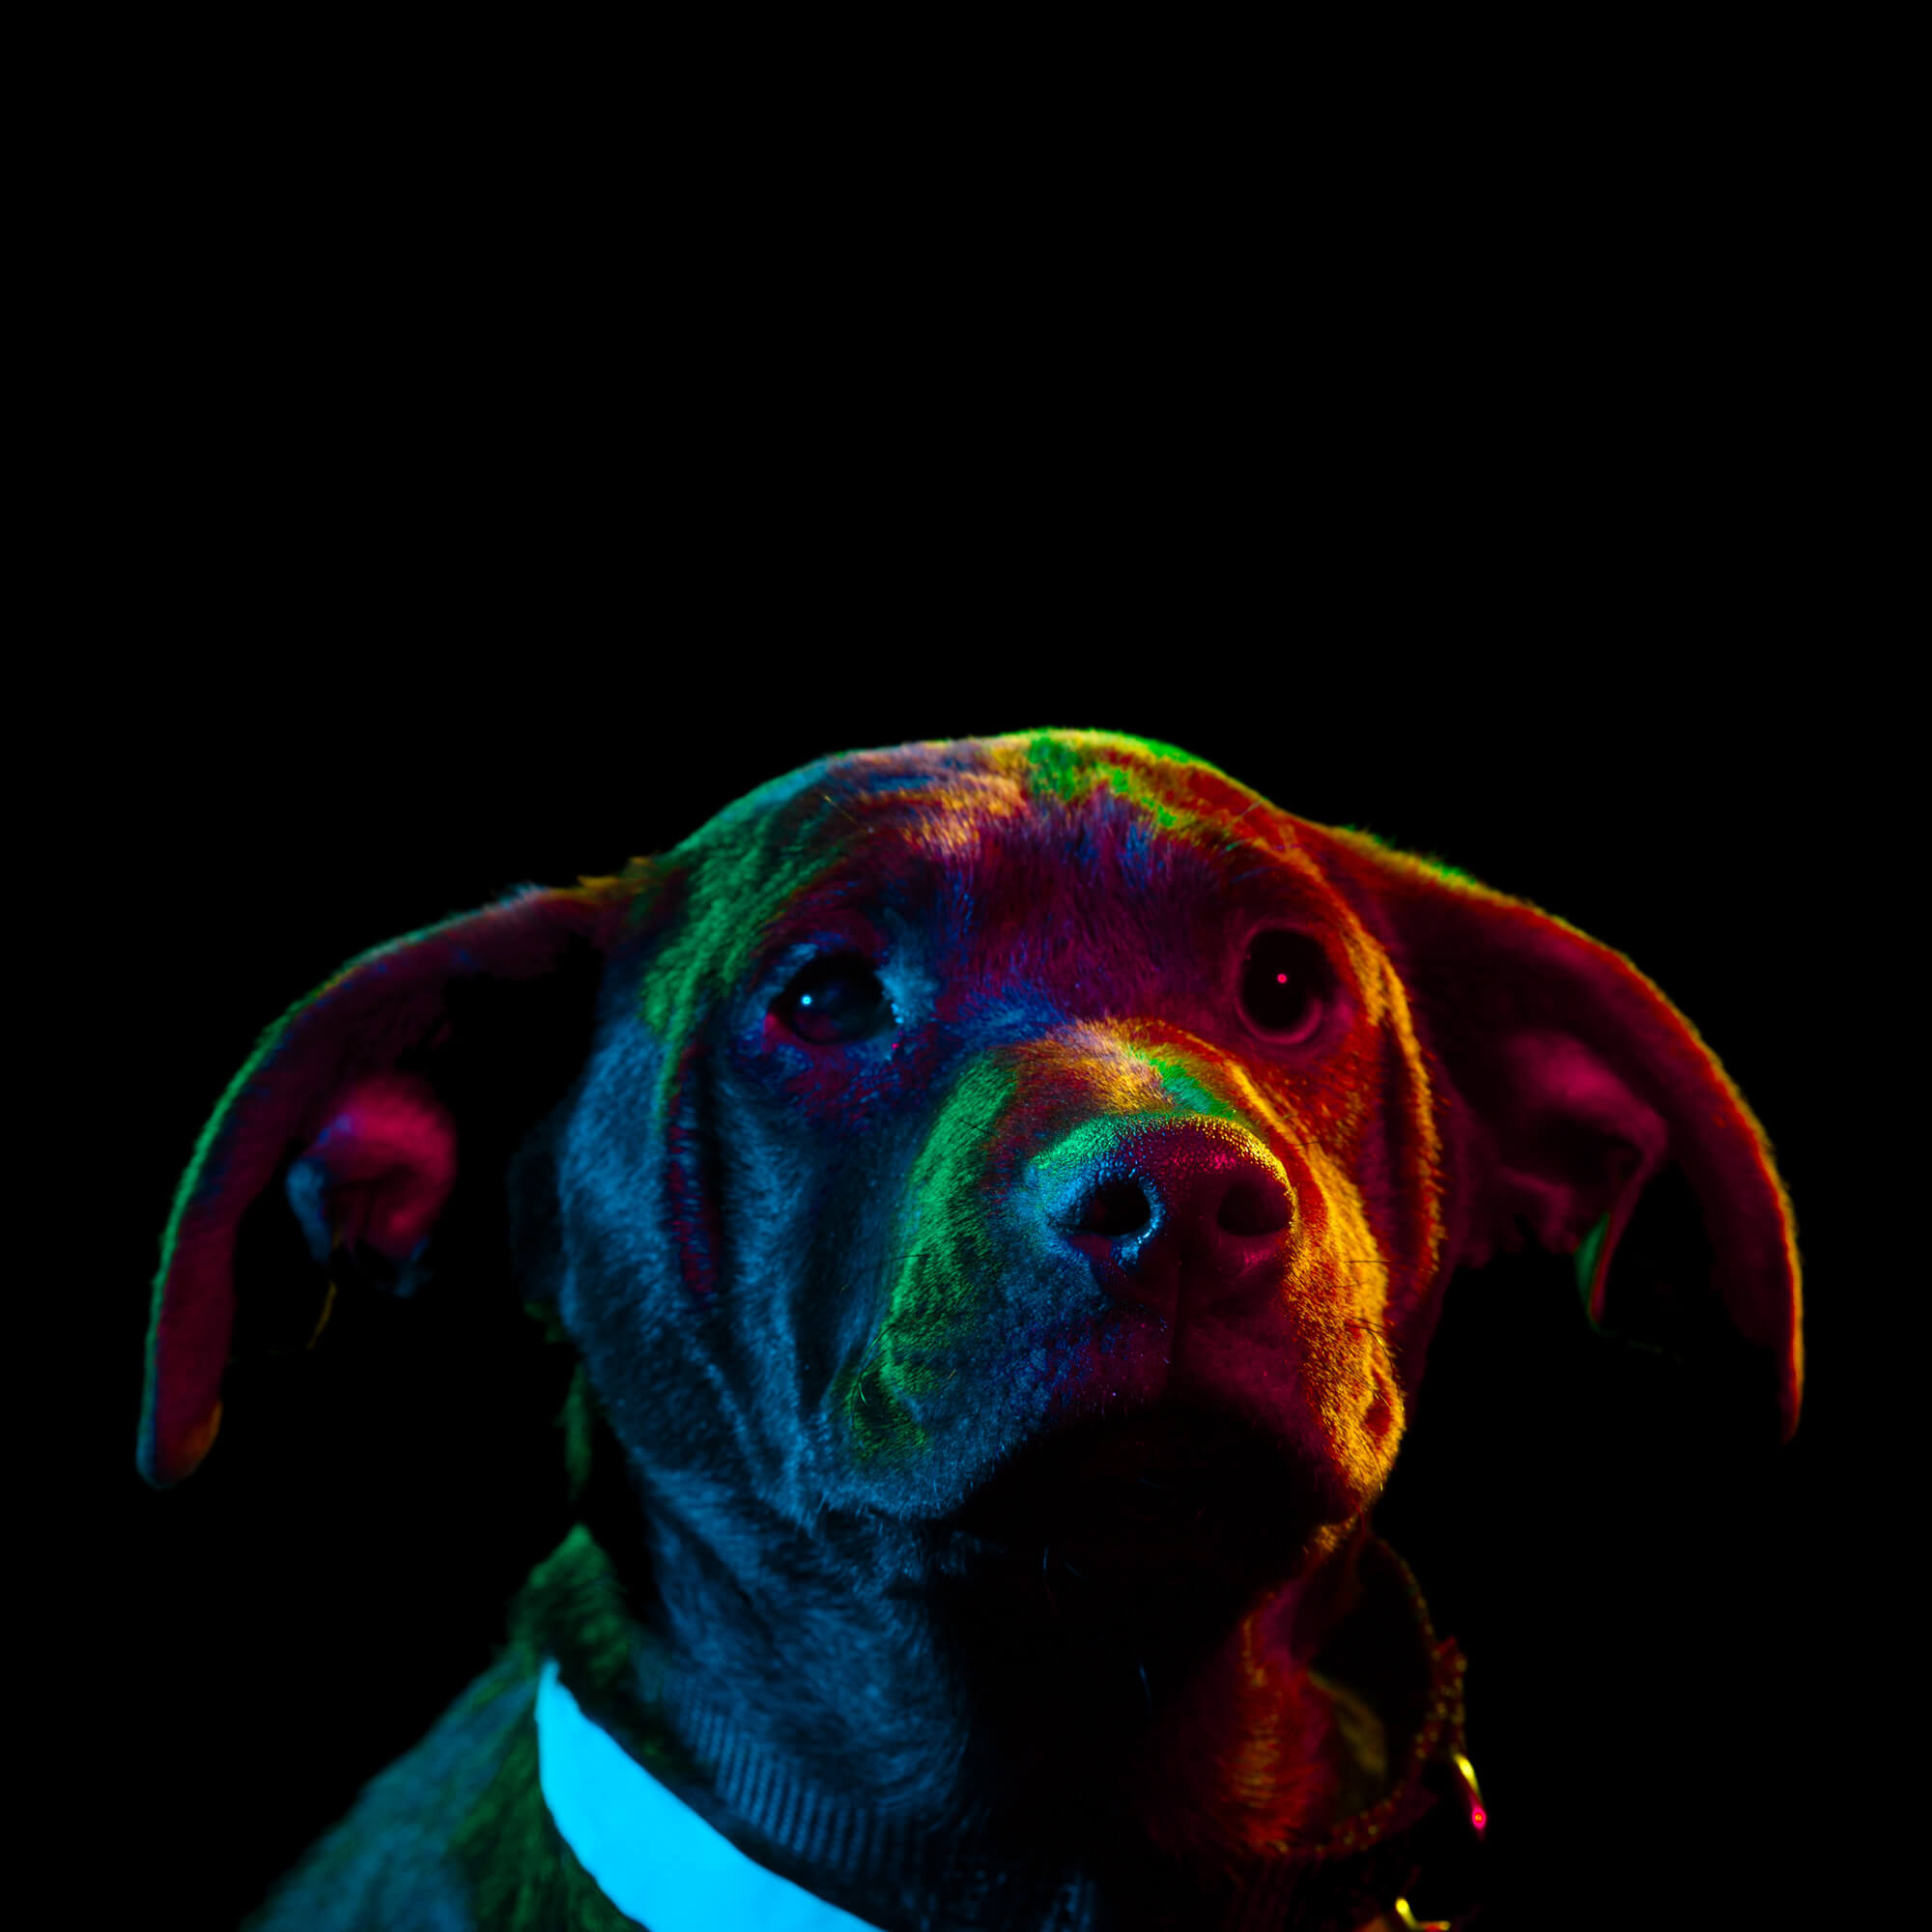 Paul Octavious adoptable dogs portraits 5 (1)